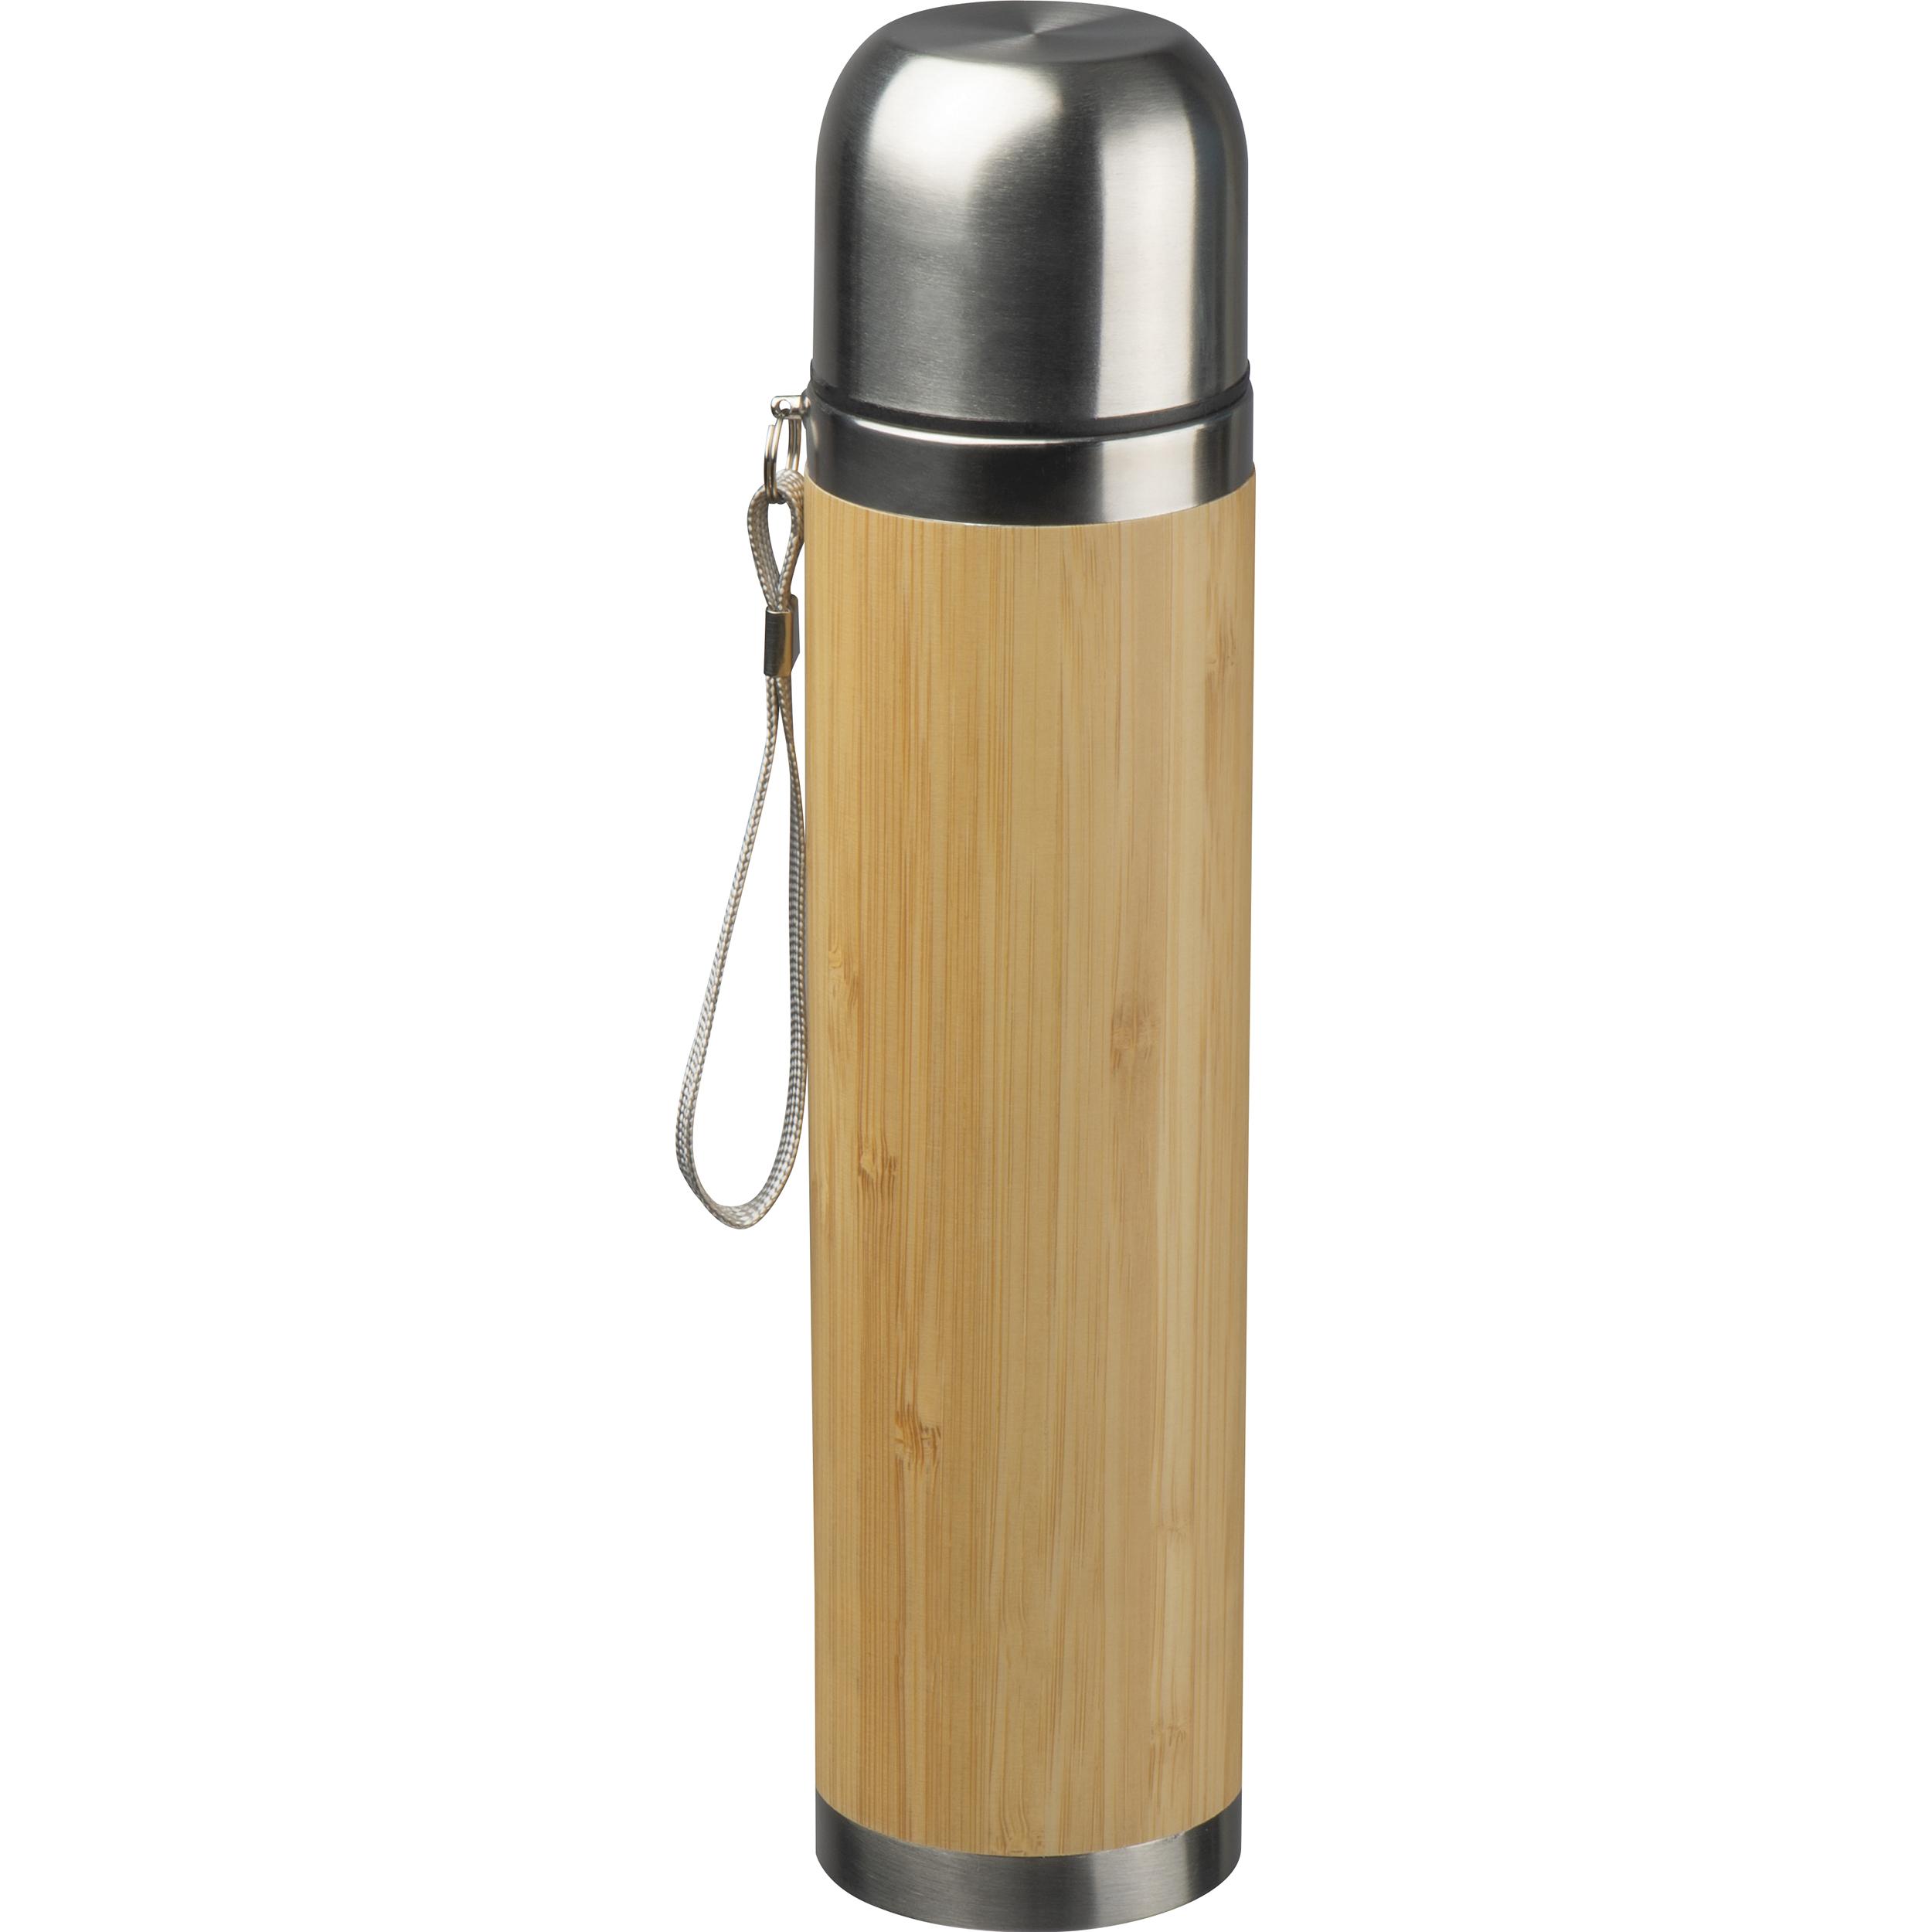 Isolierkanne mit Bambusummantelung 500 ml